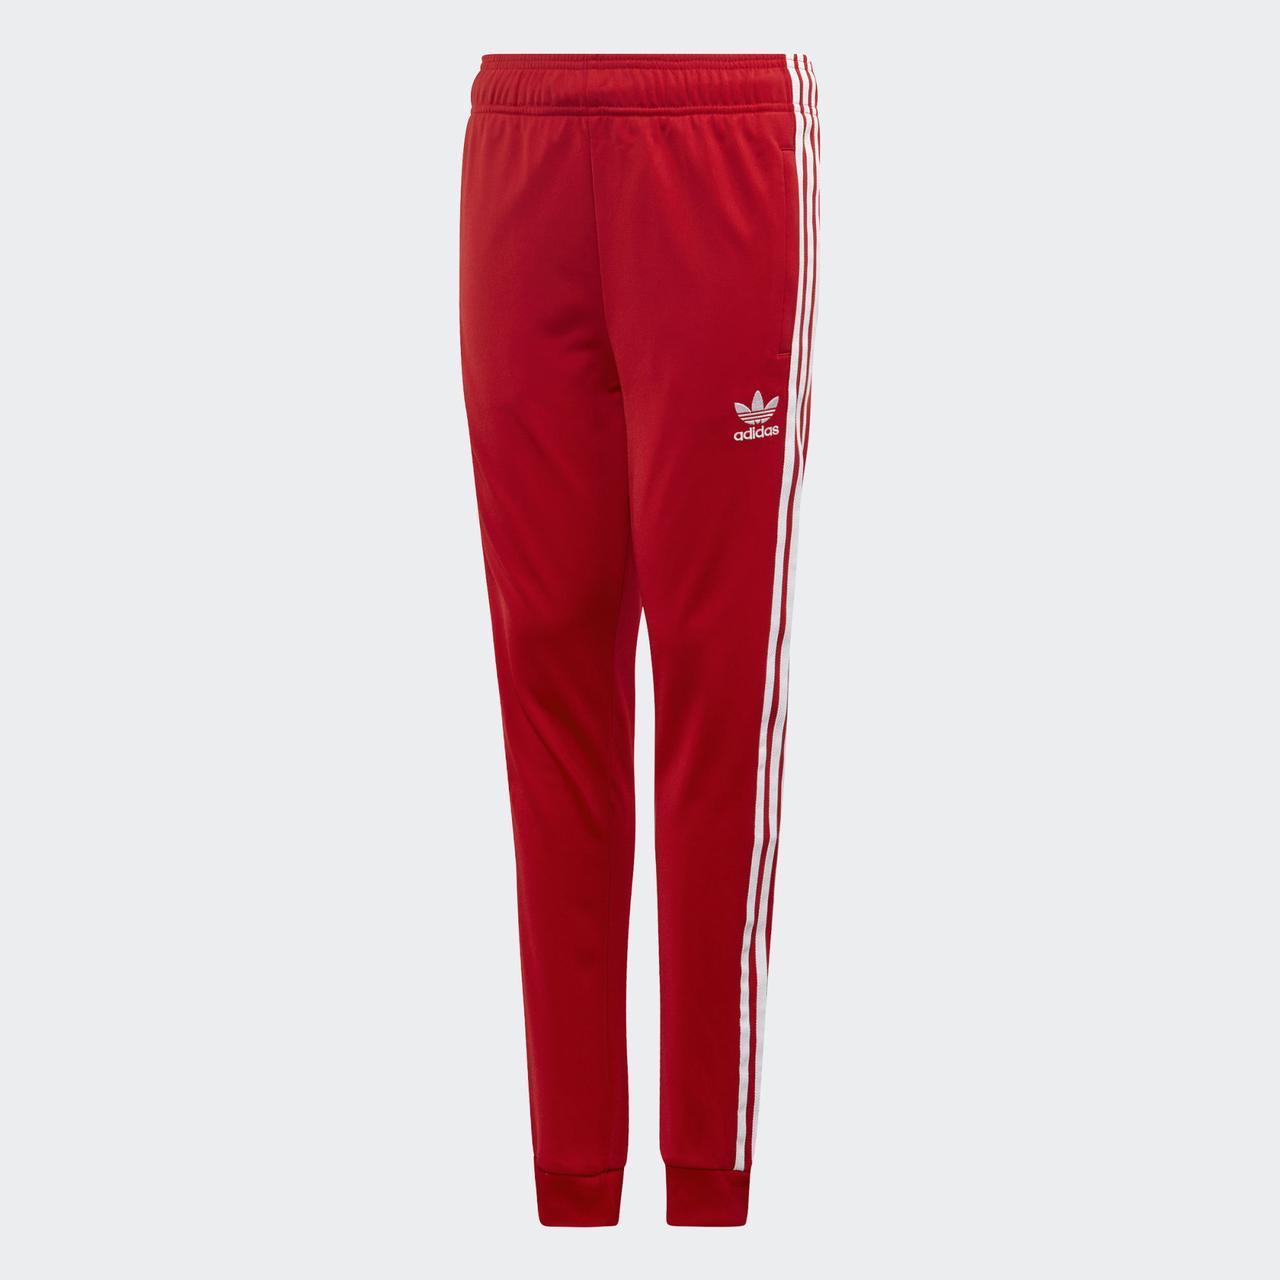 Детские брюки Adidas Originals SST EI9886